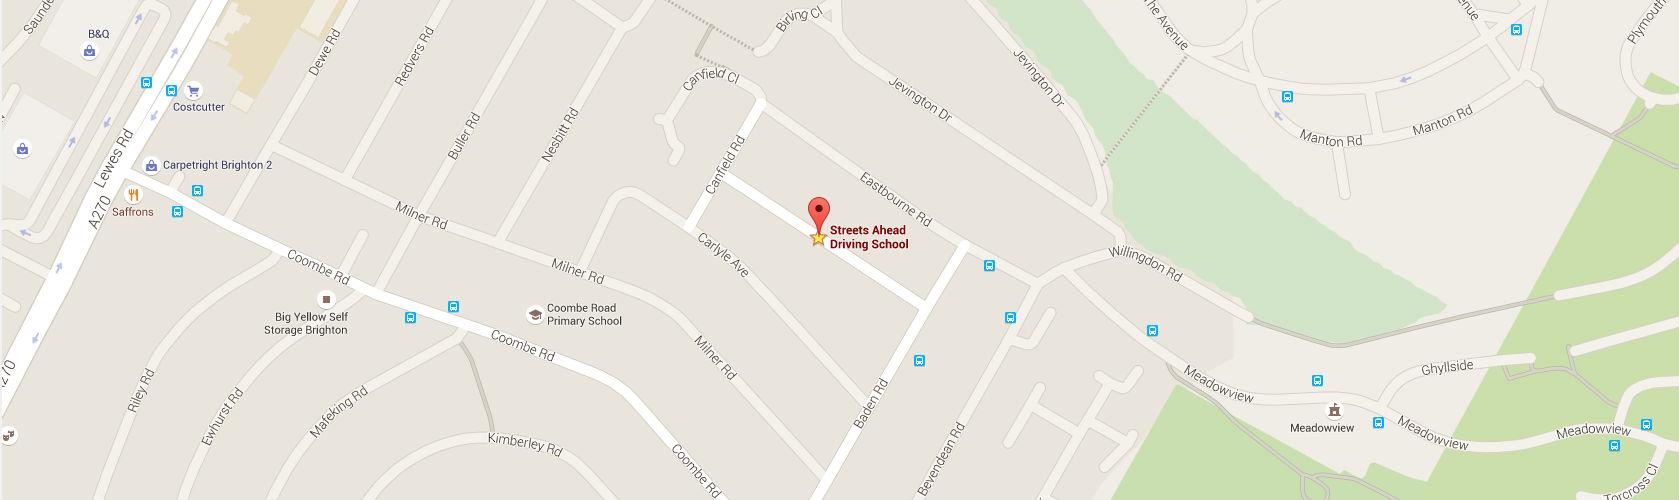 Streets Ahead Driving School Google Maps